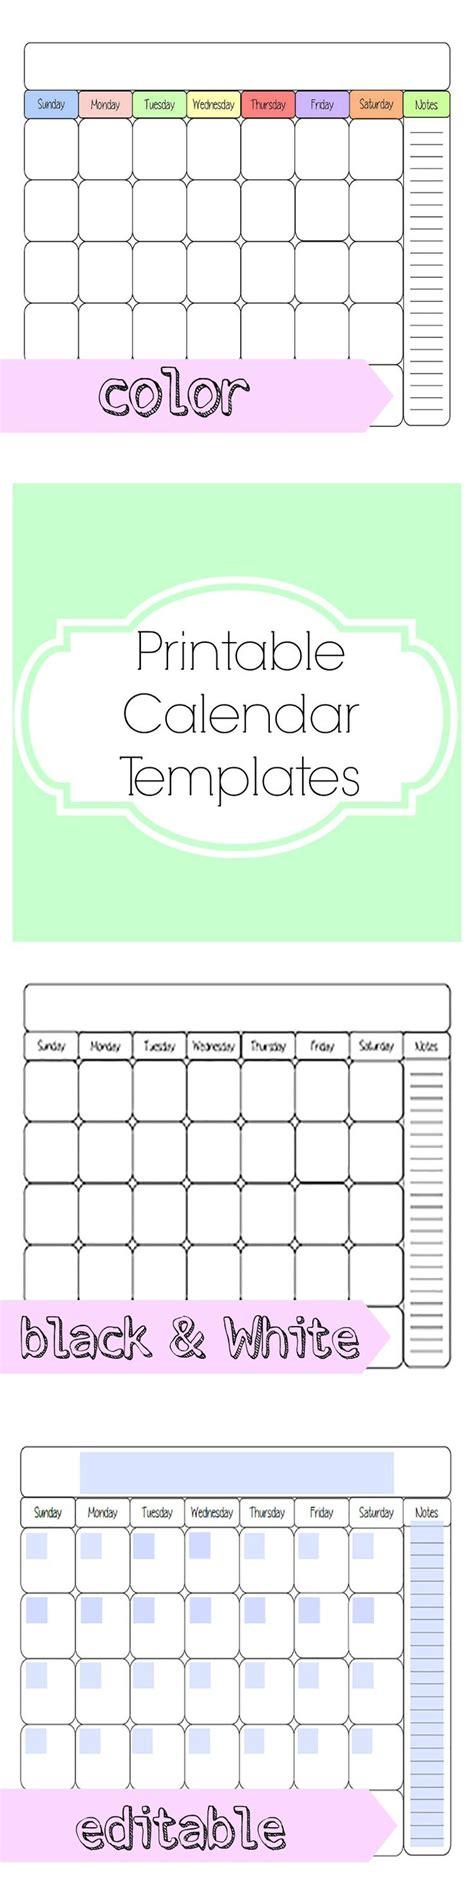 Sunday School Calendar Template by 25 Best Ideas About Printable Calendars On